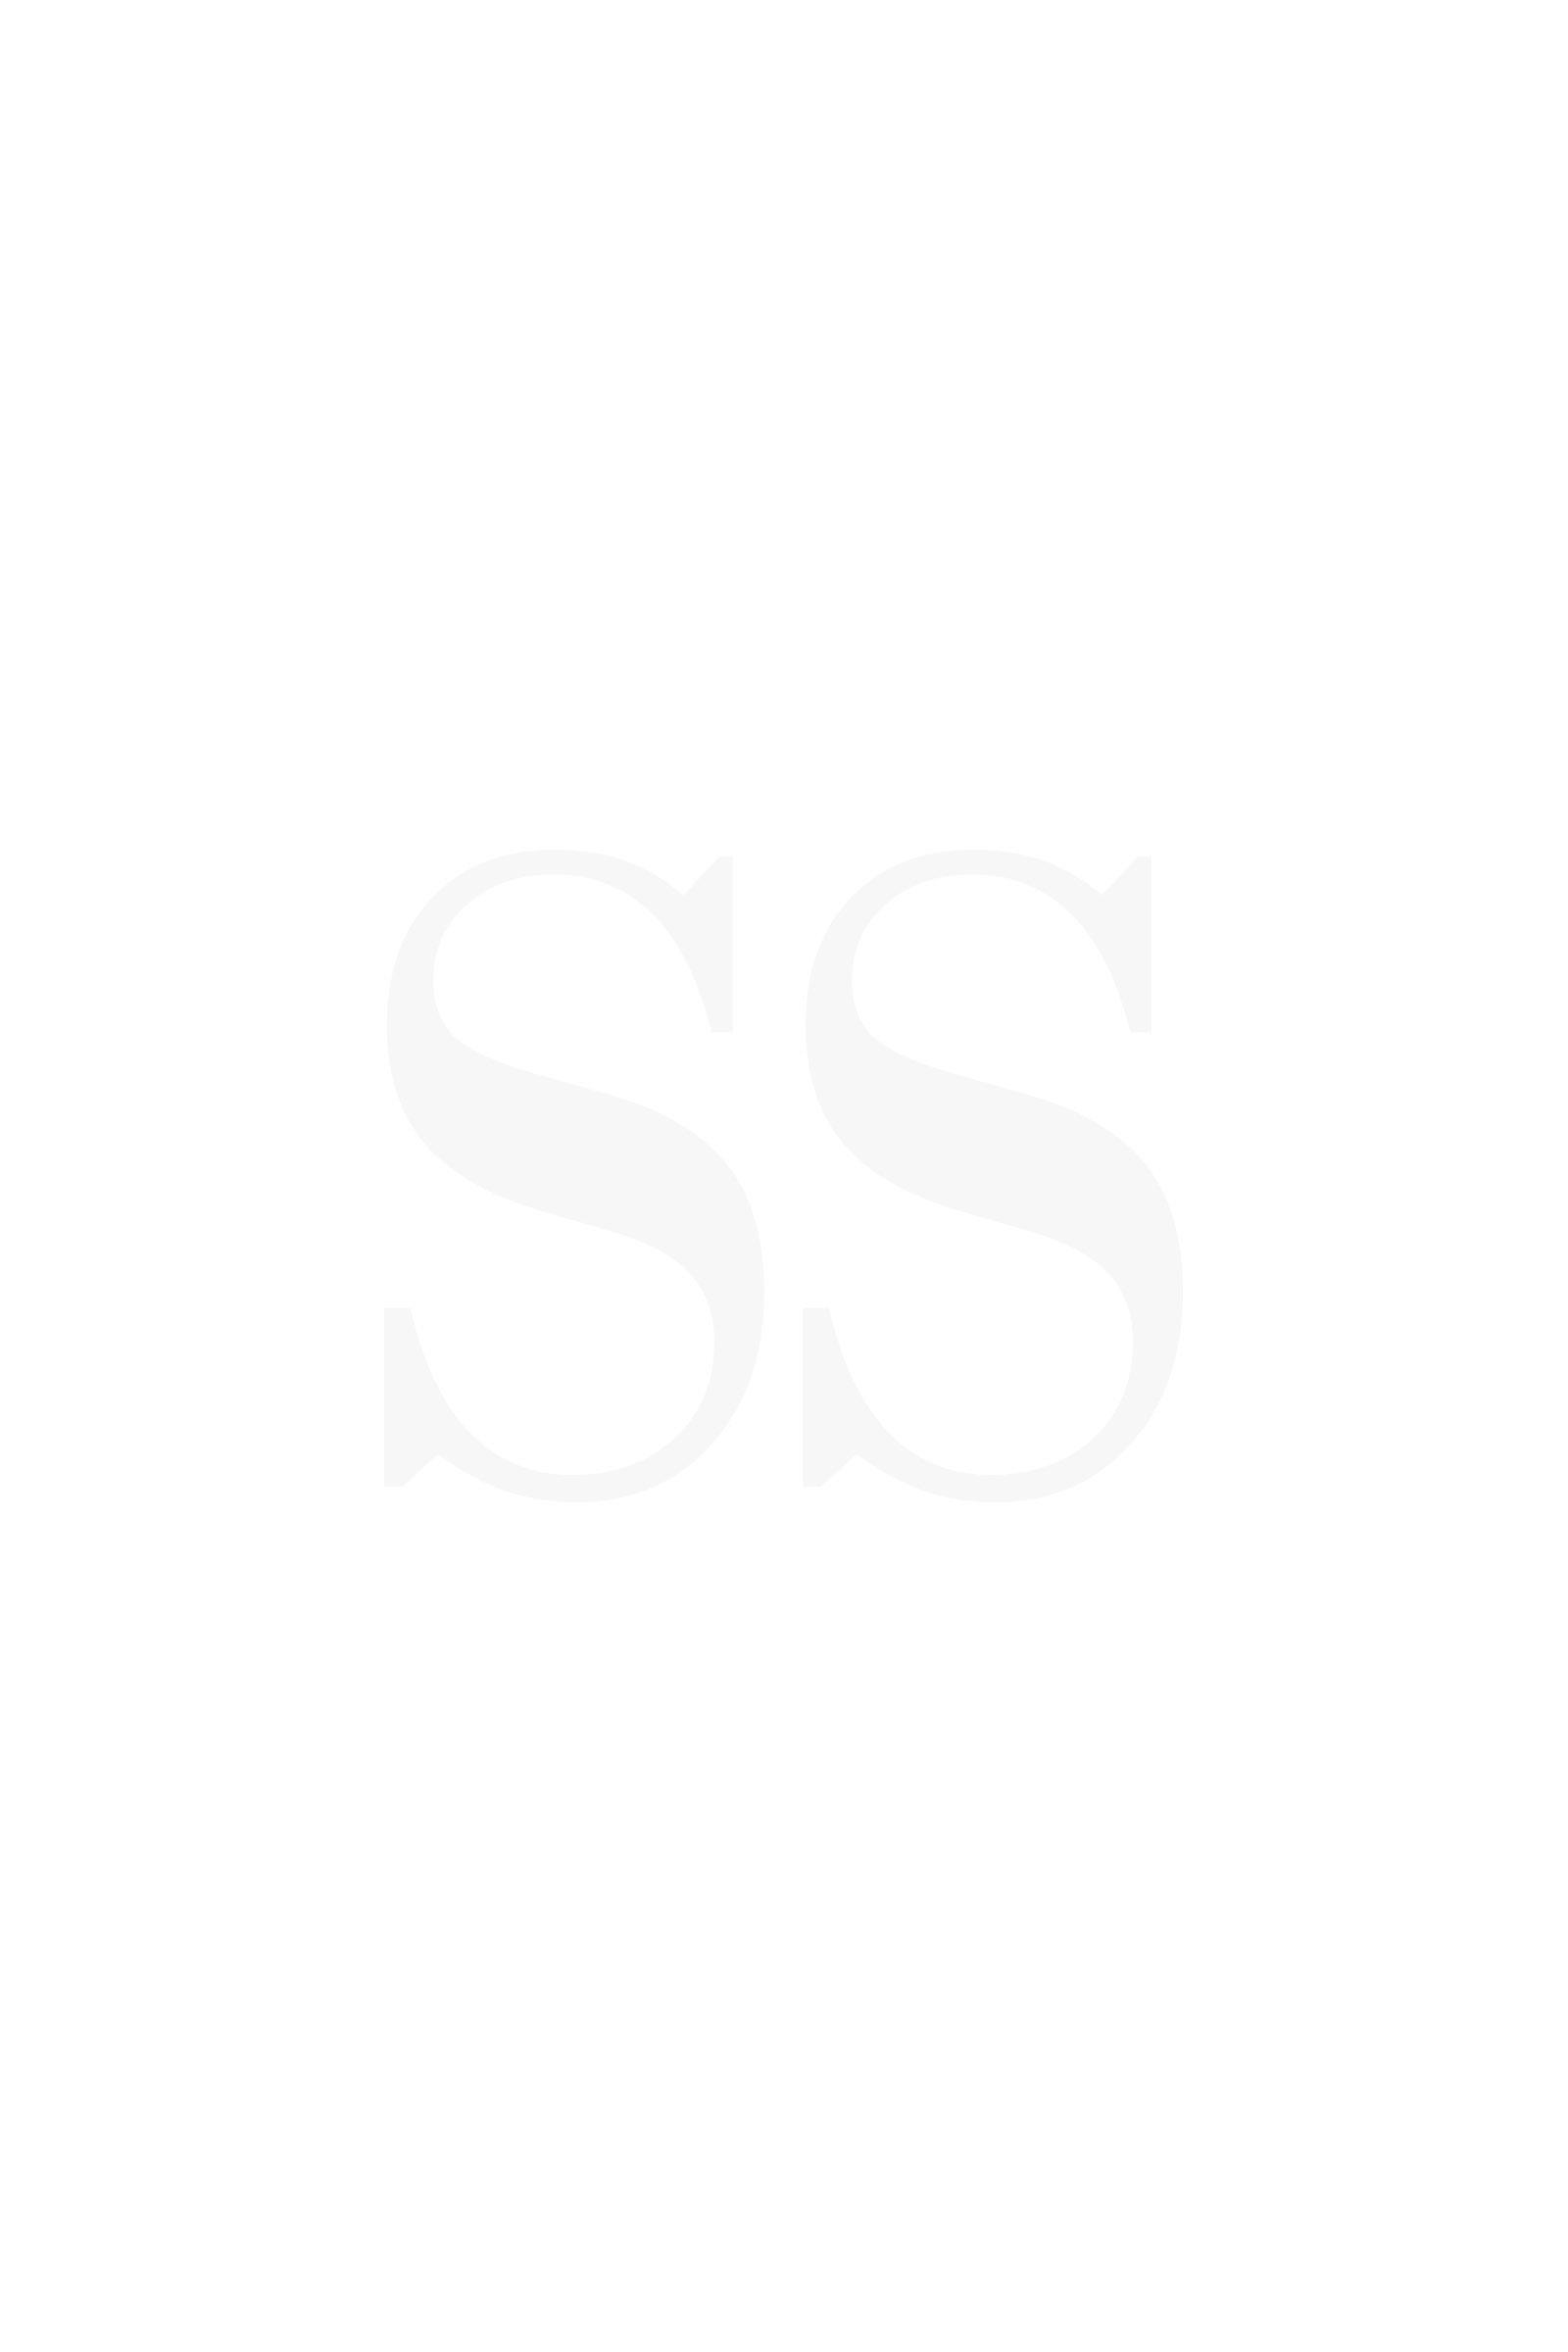 Sana Safinaz Online 025B-I